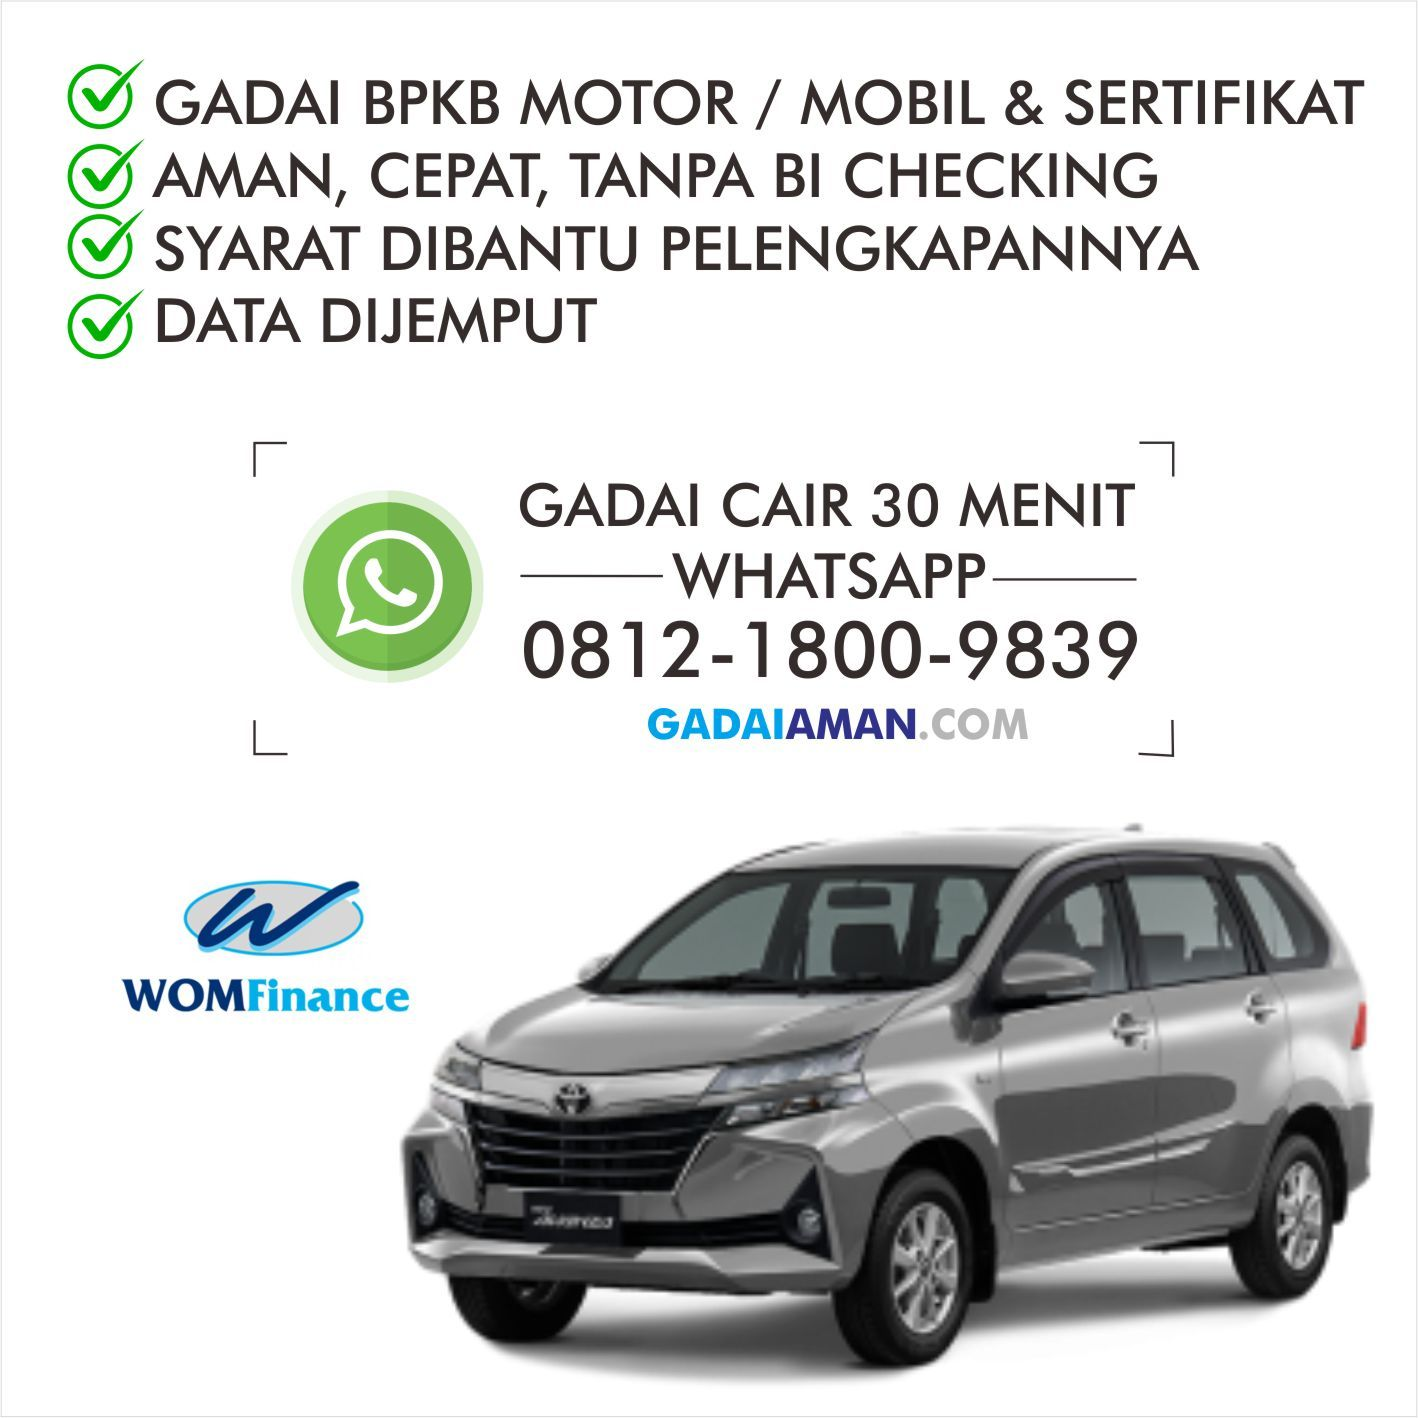 TERPERCAYA! WA: 0812-1800-9839 Gadai Fisik Mobil Tanpa ...